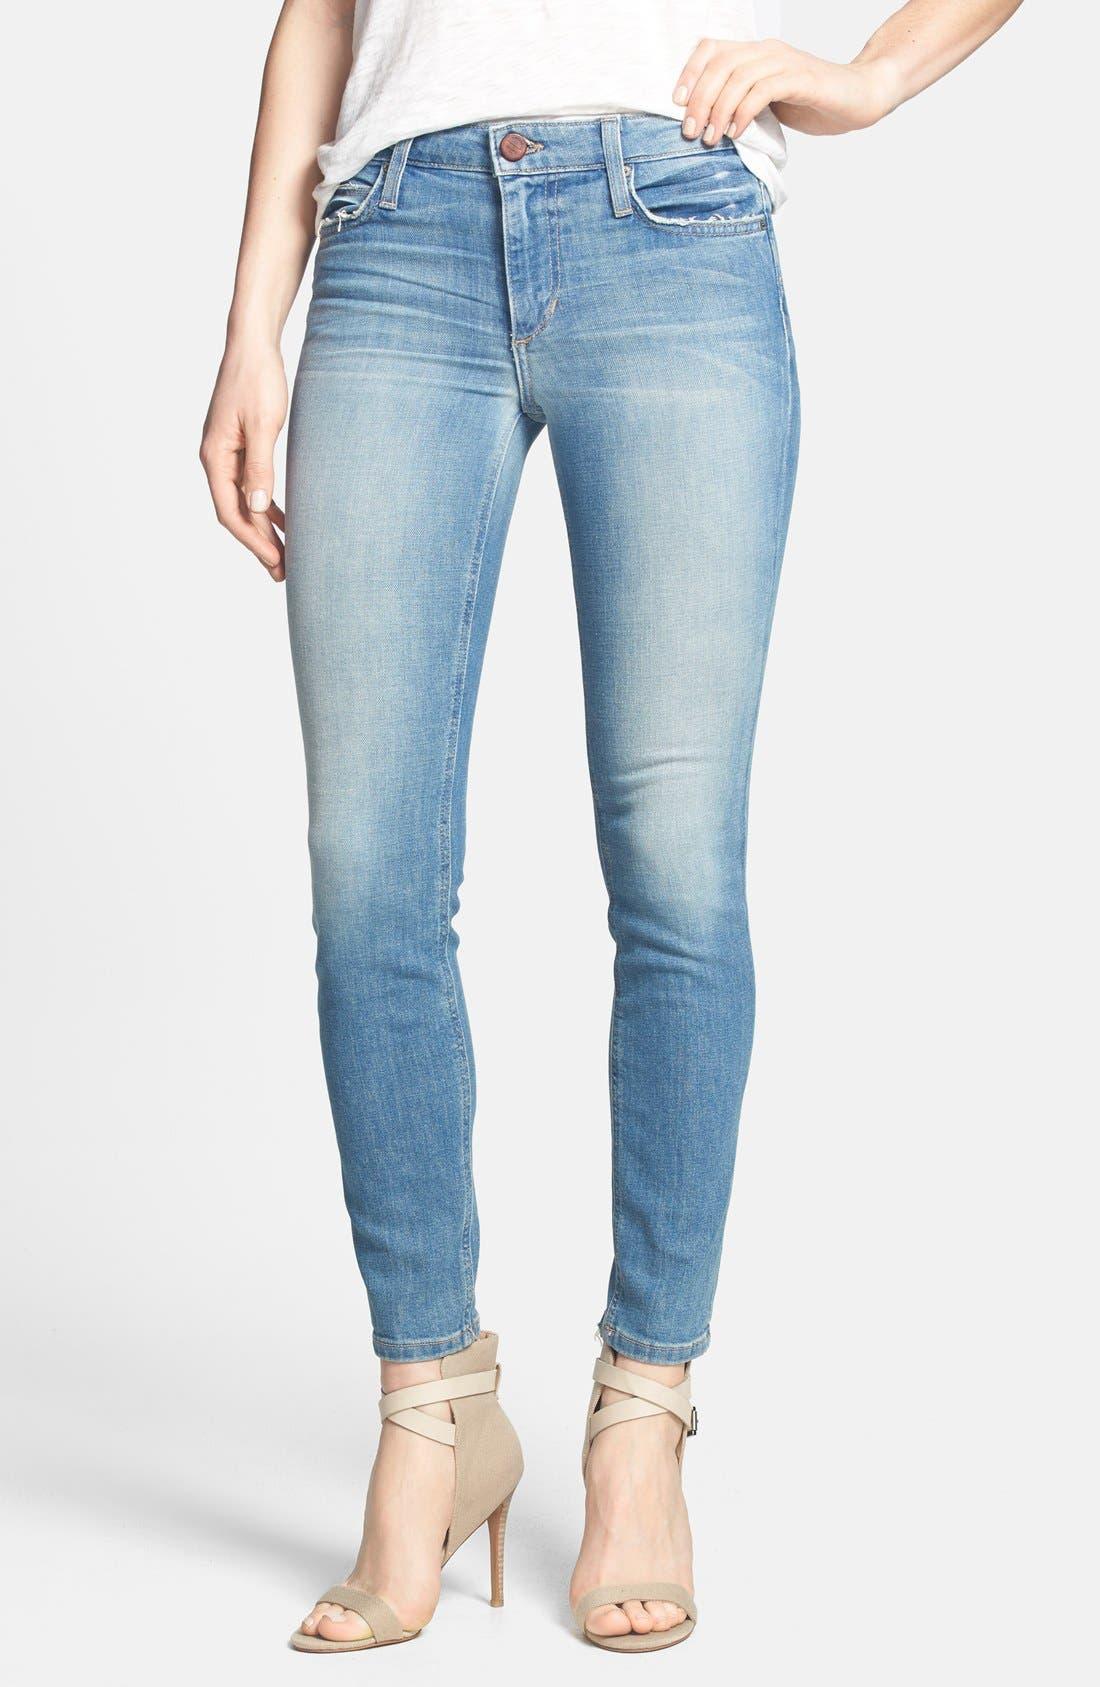 Alternate Image 1 Selected - Joe's Skinny Ankle Jeans (Margo)